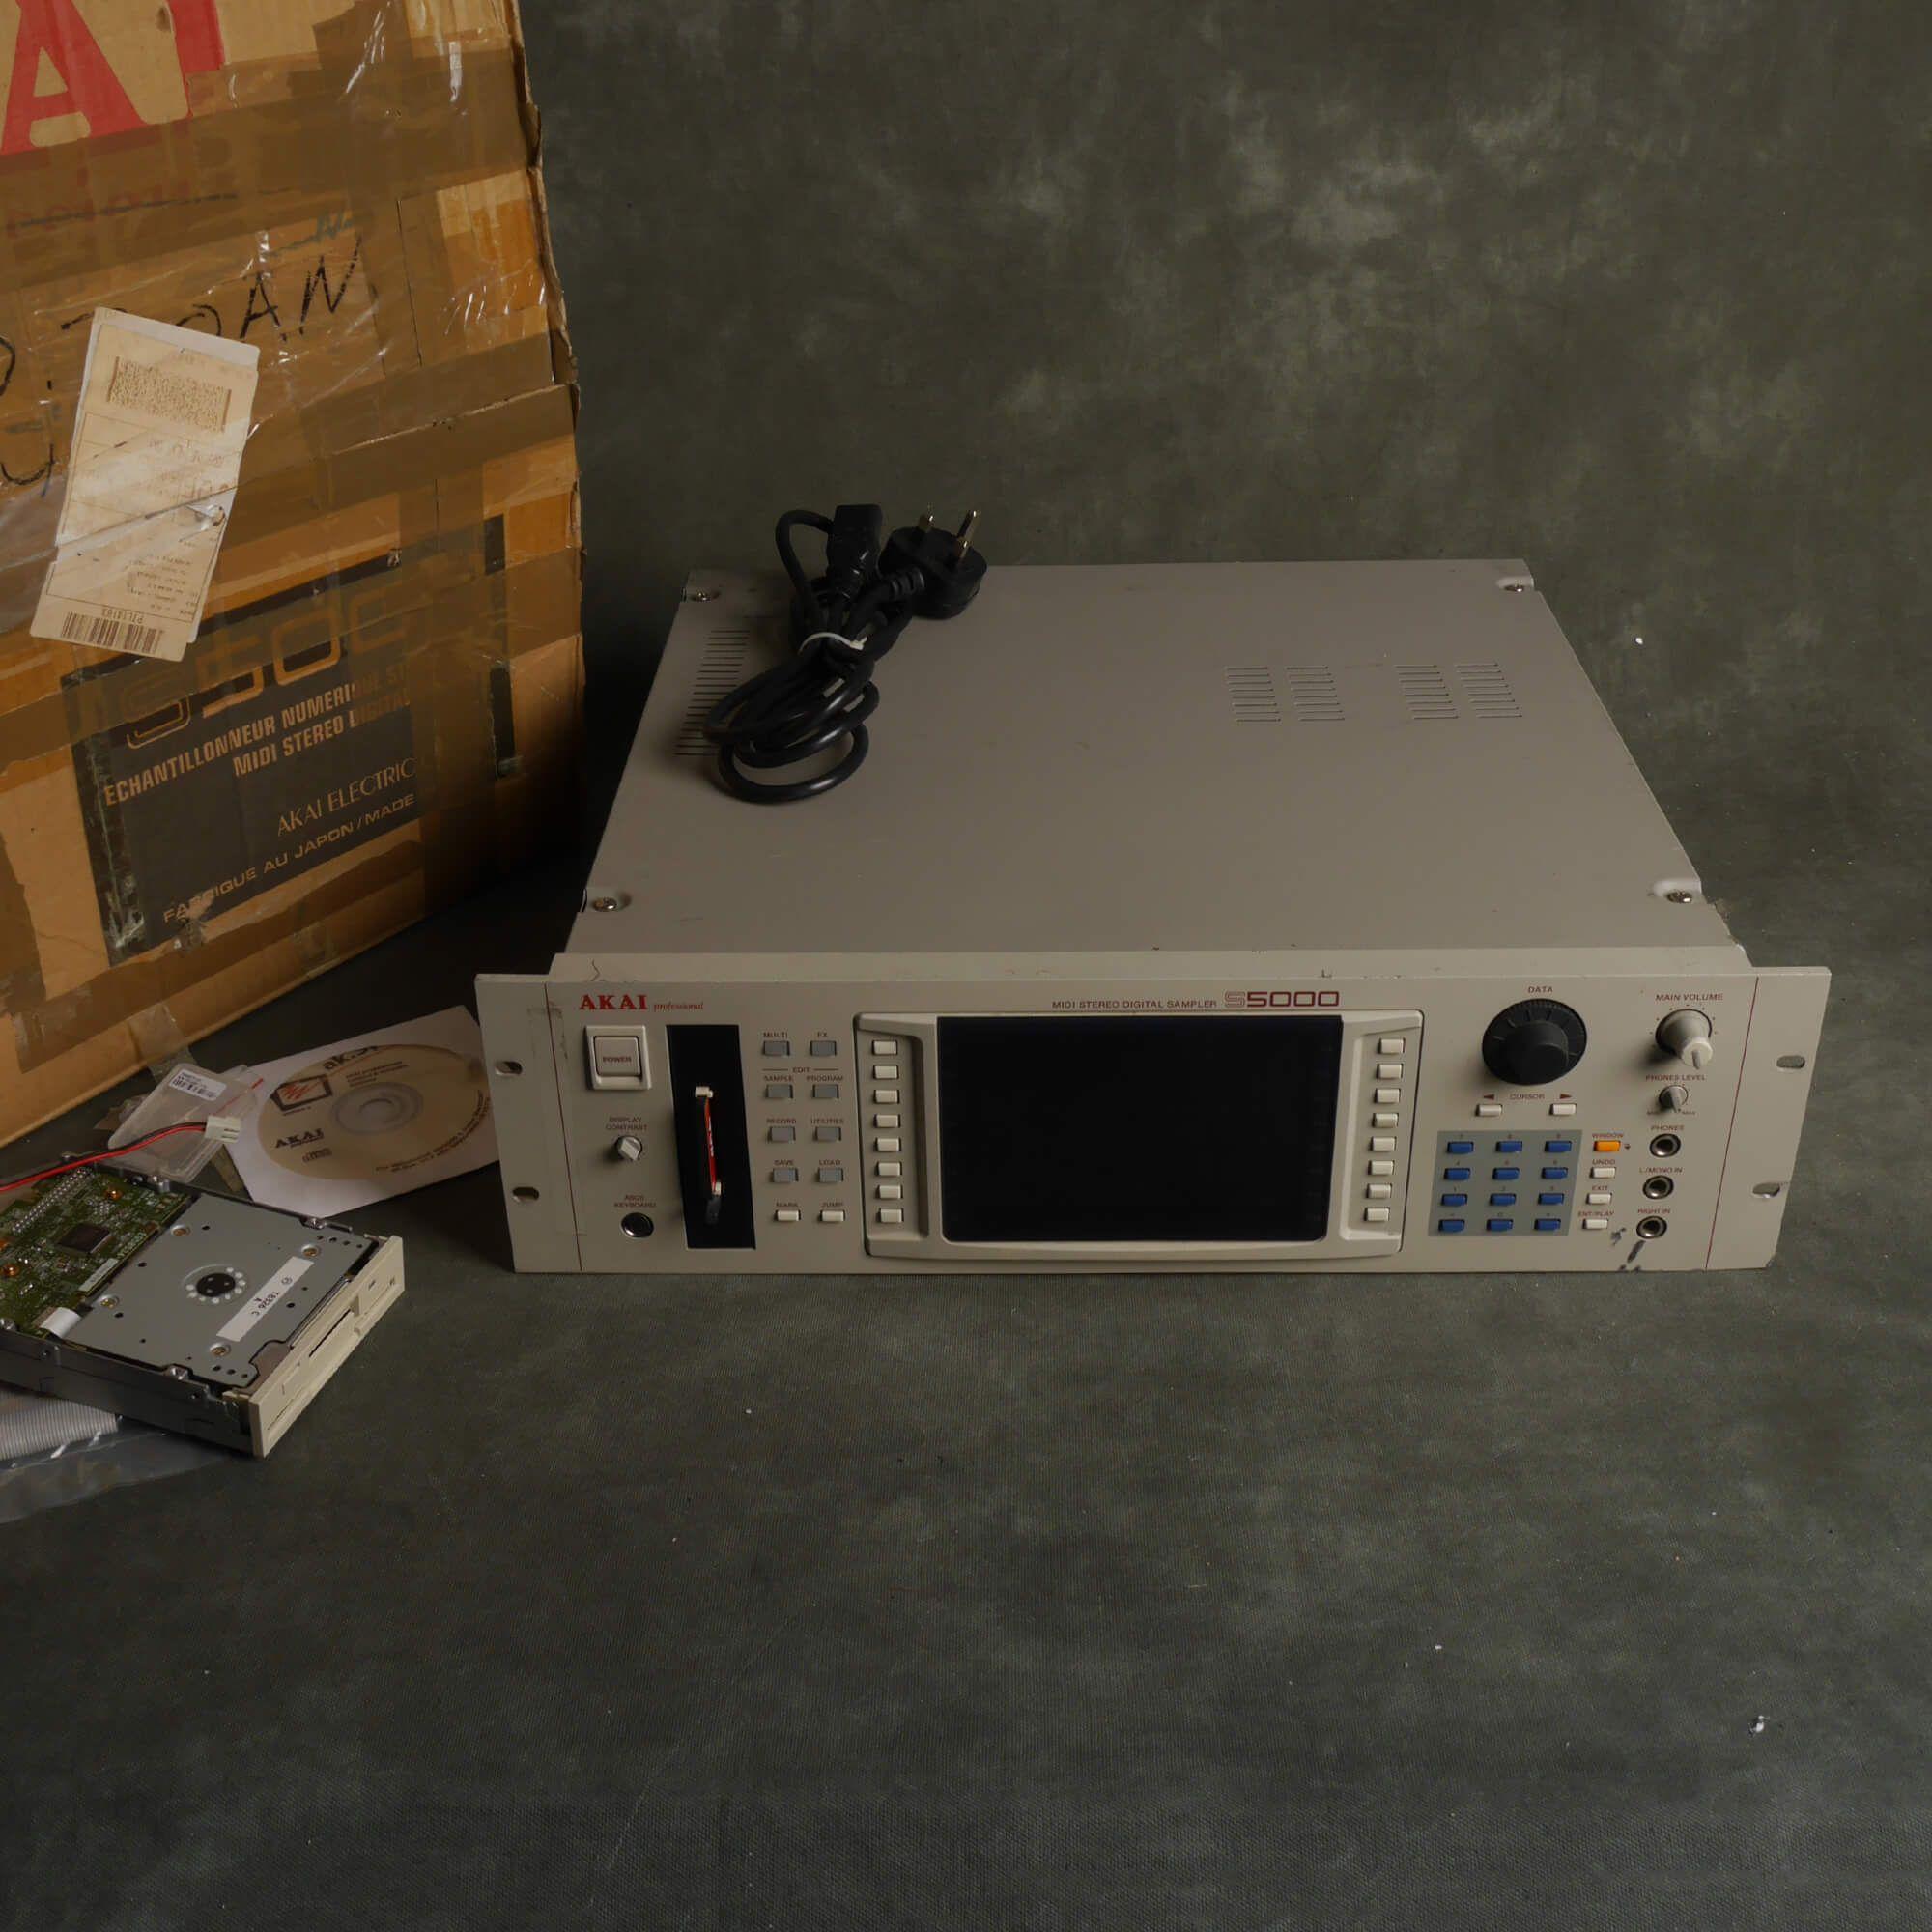 Akai S5000 Rack Sampler 256mb/4Gb Flash, No USB w/Box - 2nd Hand